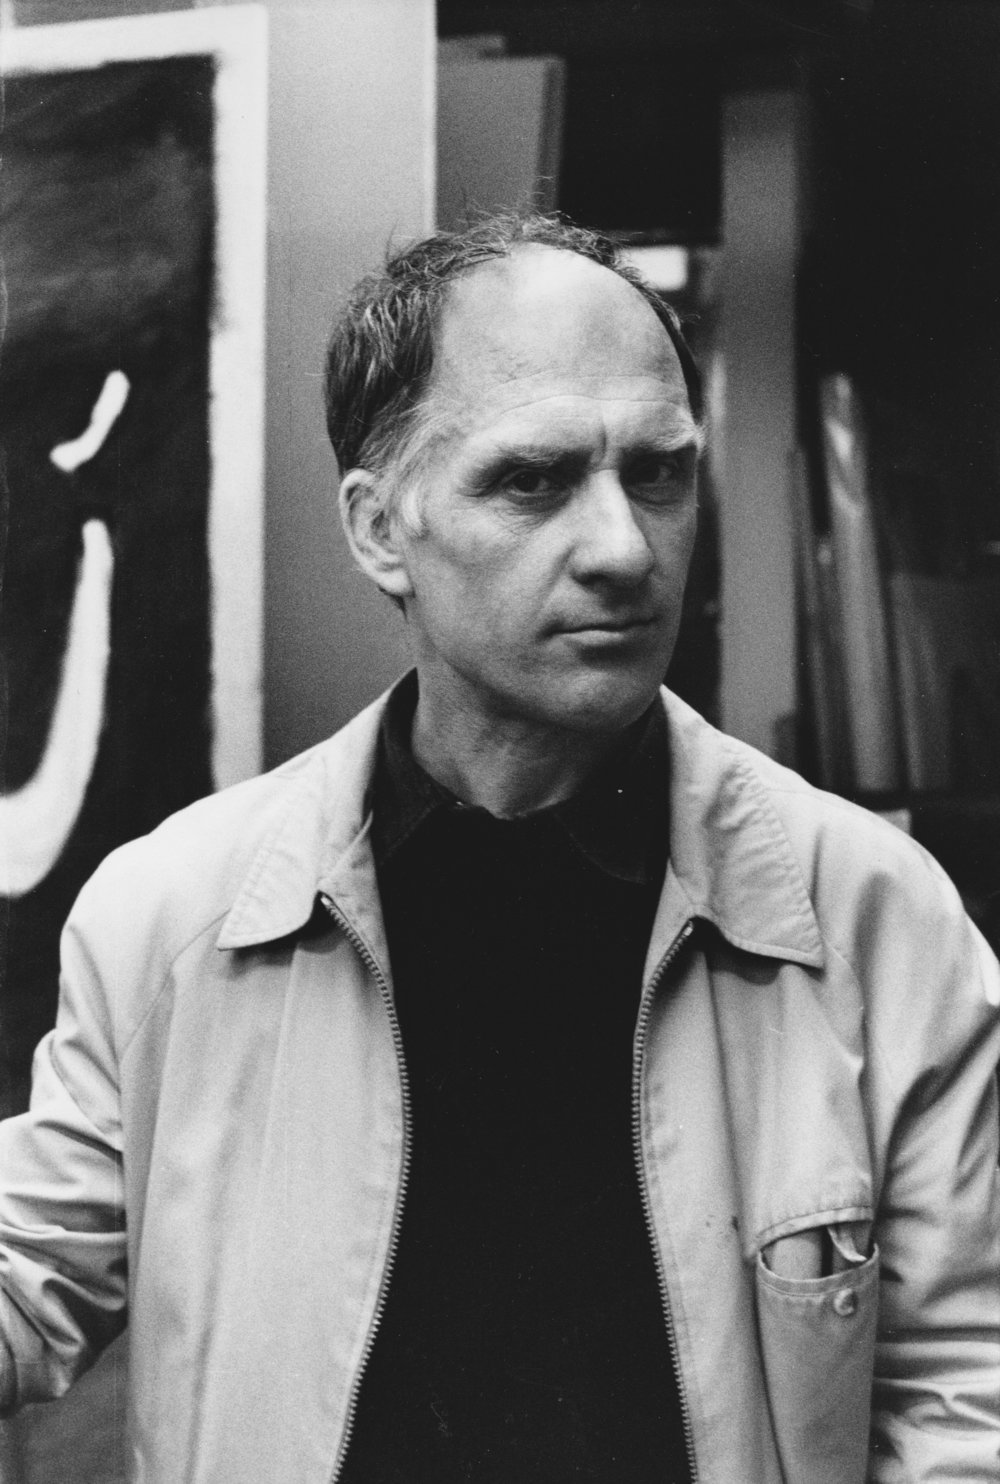 Ken Kiff RA (1935 – 2001) figurative artist in studio